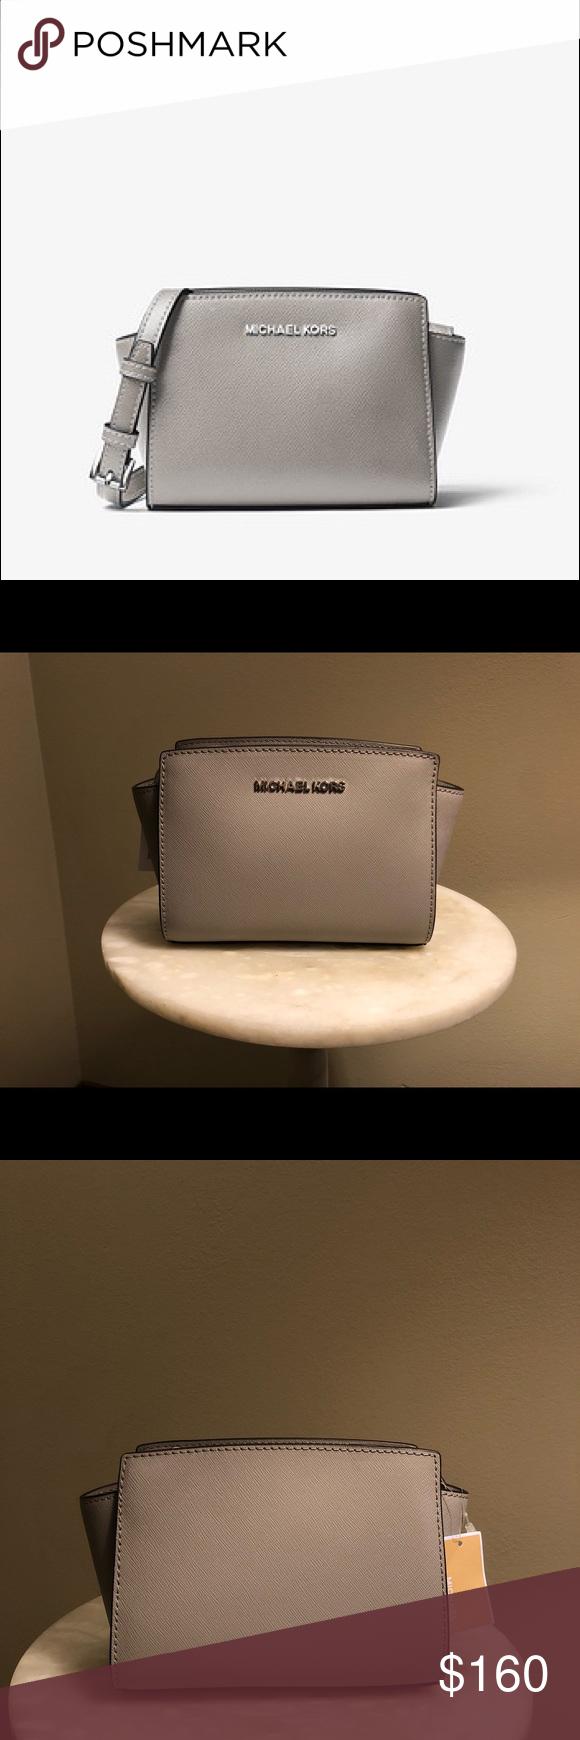 NWT MICHAEL KORS Selma Mini Gray Crossbody NWT Michael Kors Selma Mini  Crossbody. 100% Crossgrain Leather •Silver-Tone Hardware •8.25